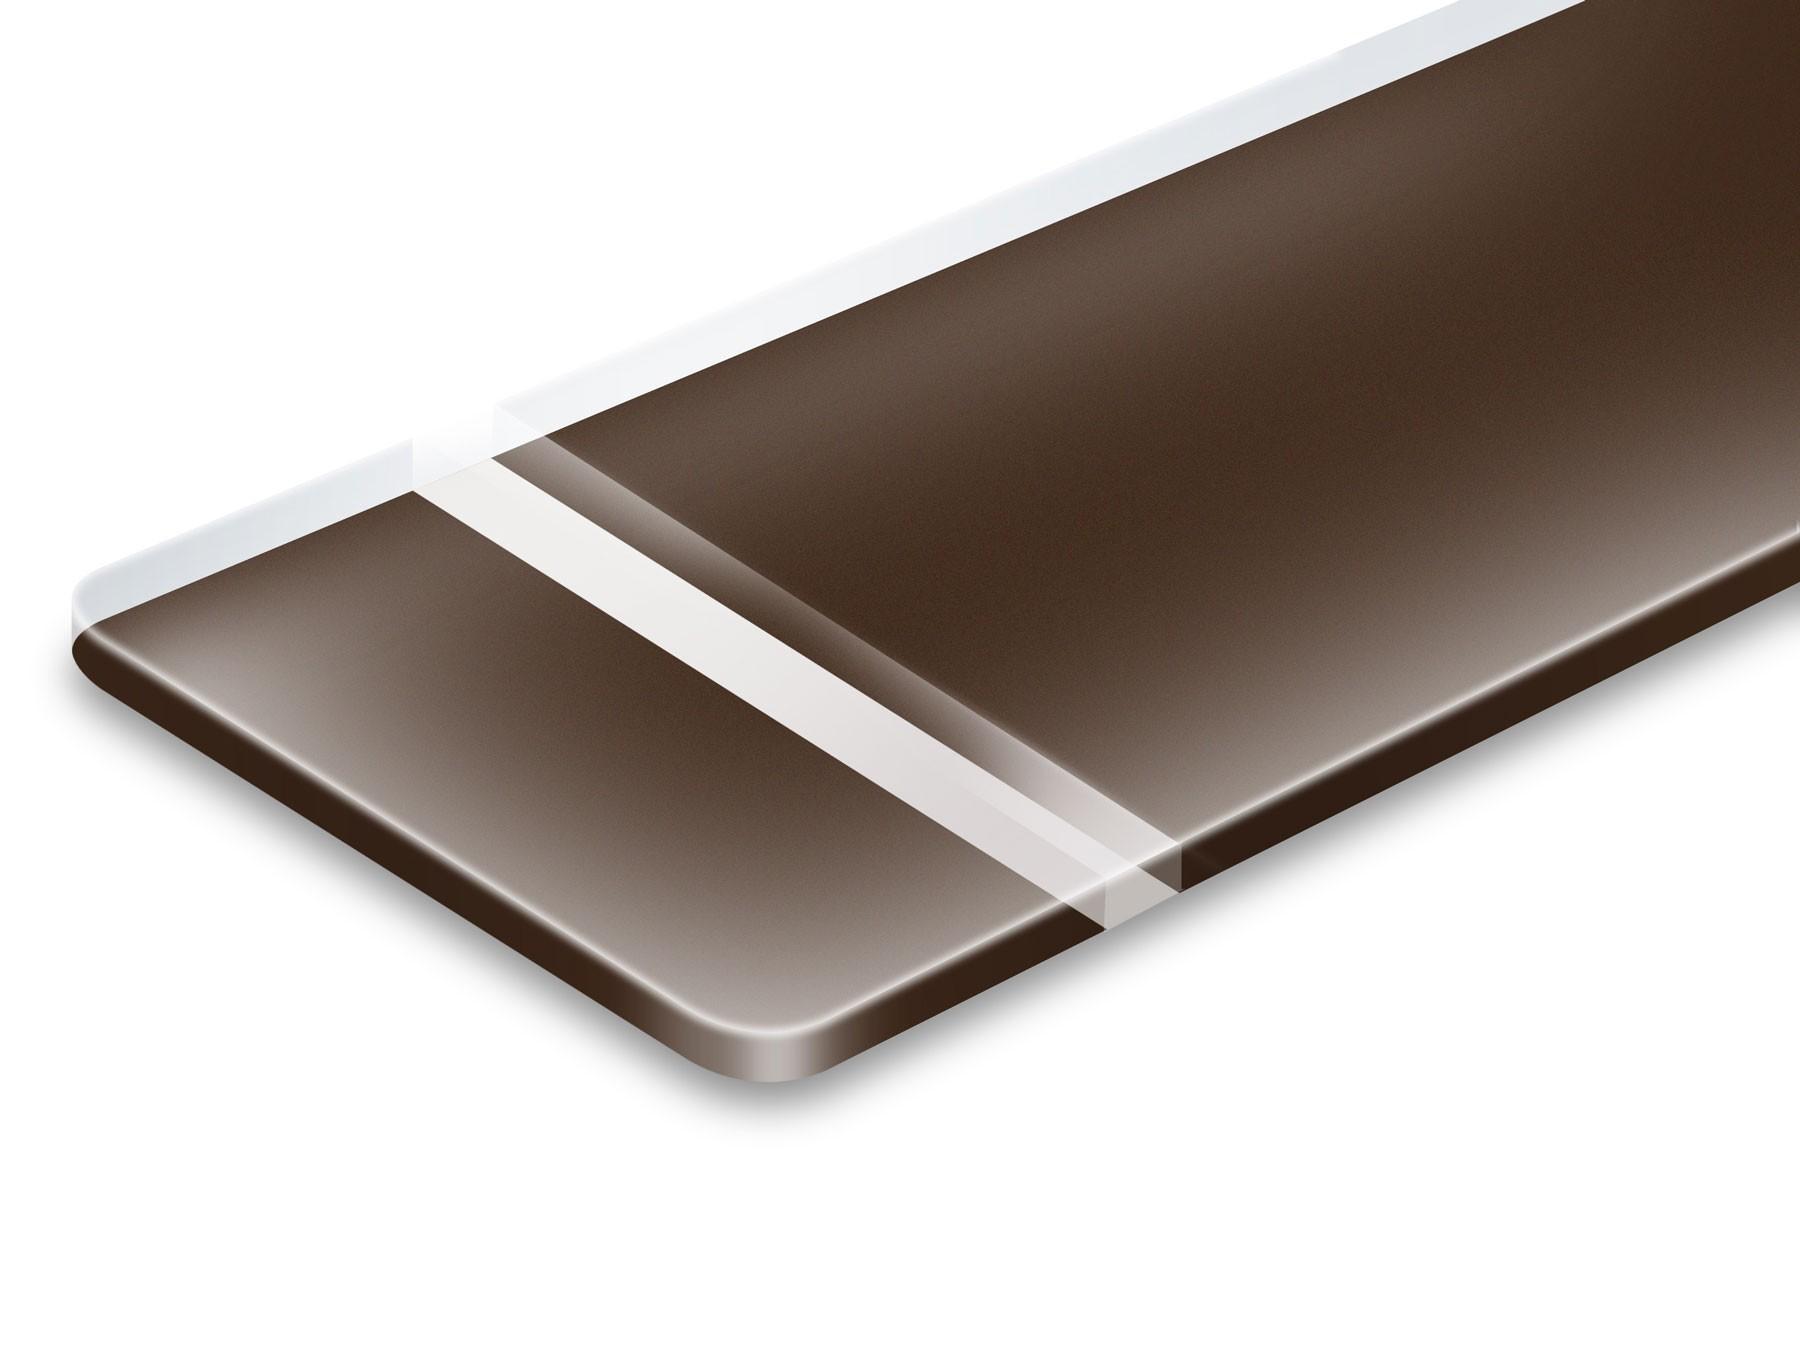 TroLase Reverse, Matte/Dark Brown, 2ply, 1.6 mm